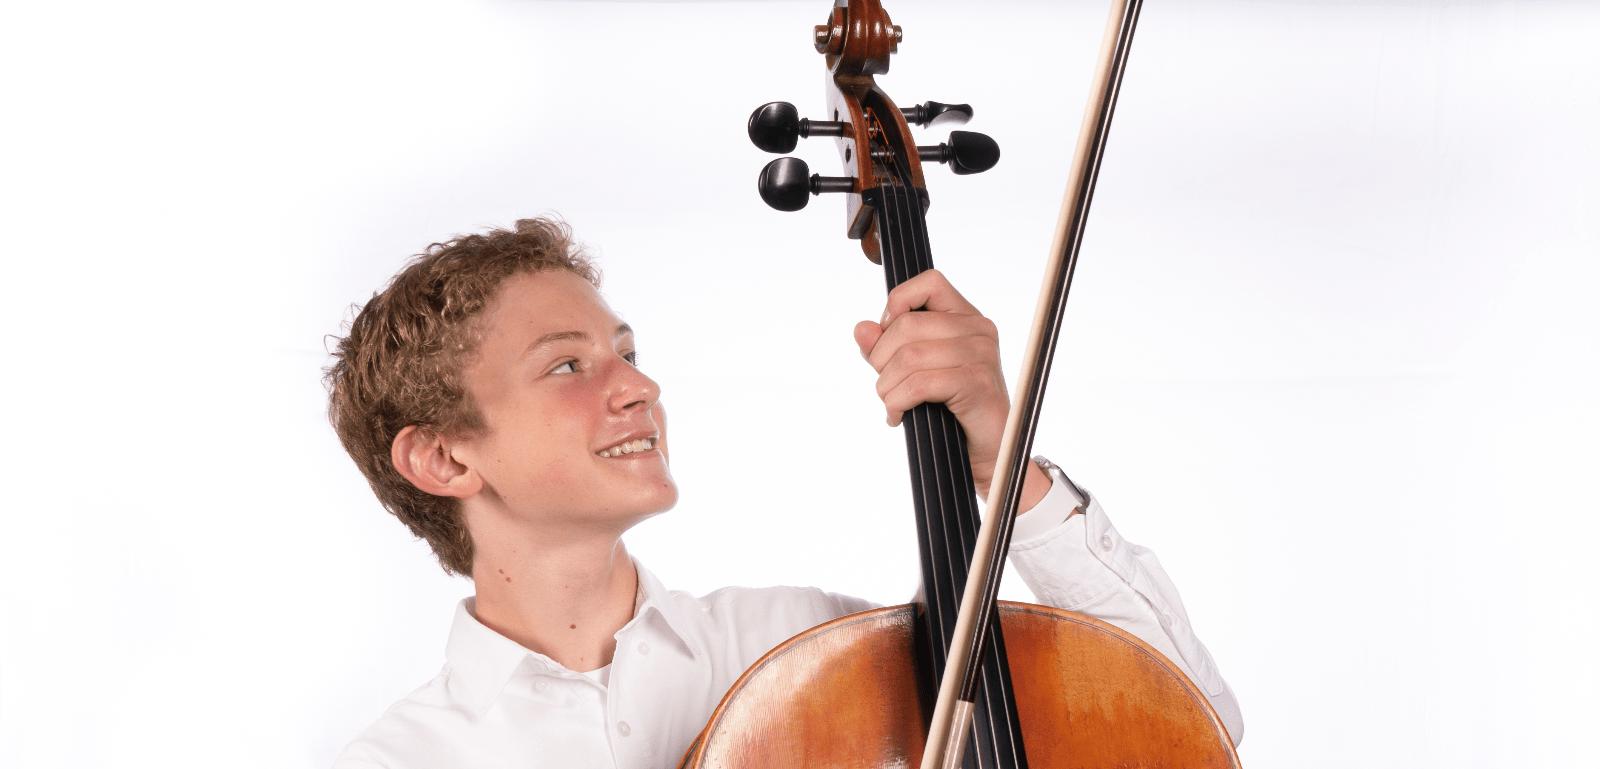 Conservatory Orchestra & String Ensemble Concert: Autumn Overtures